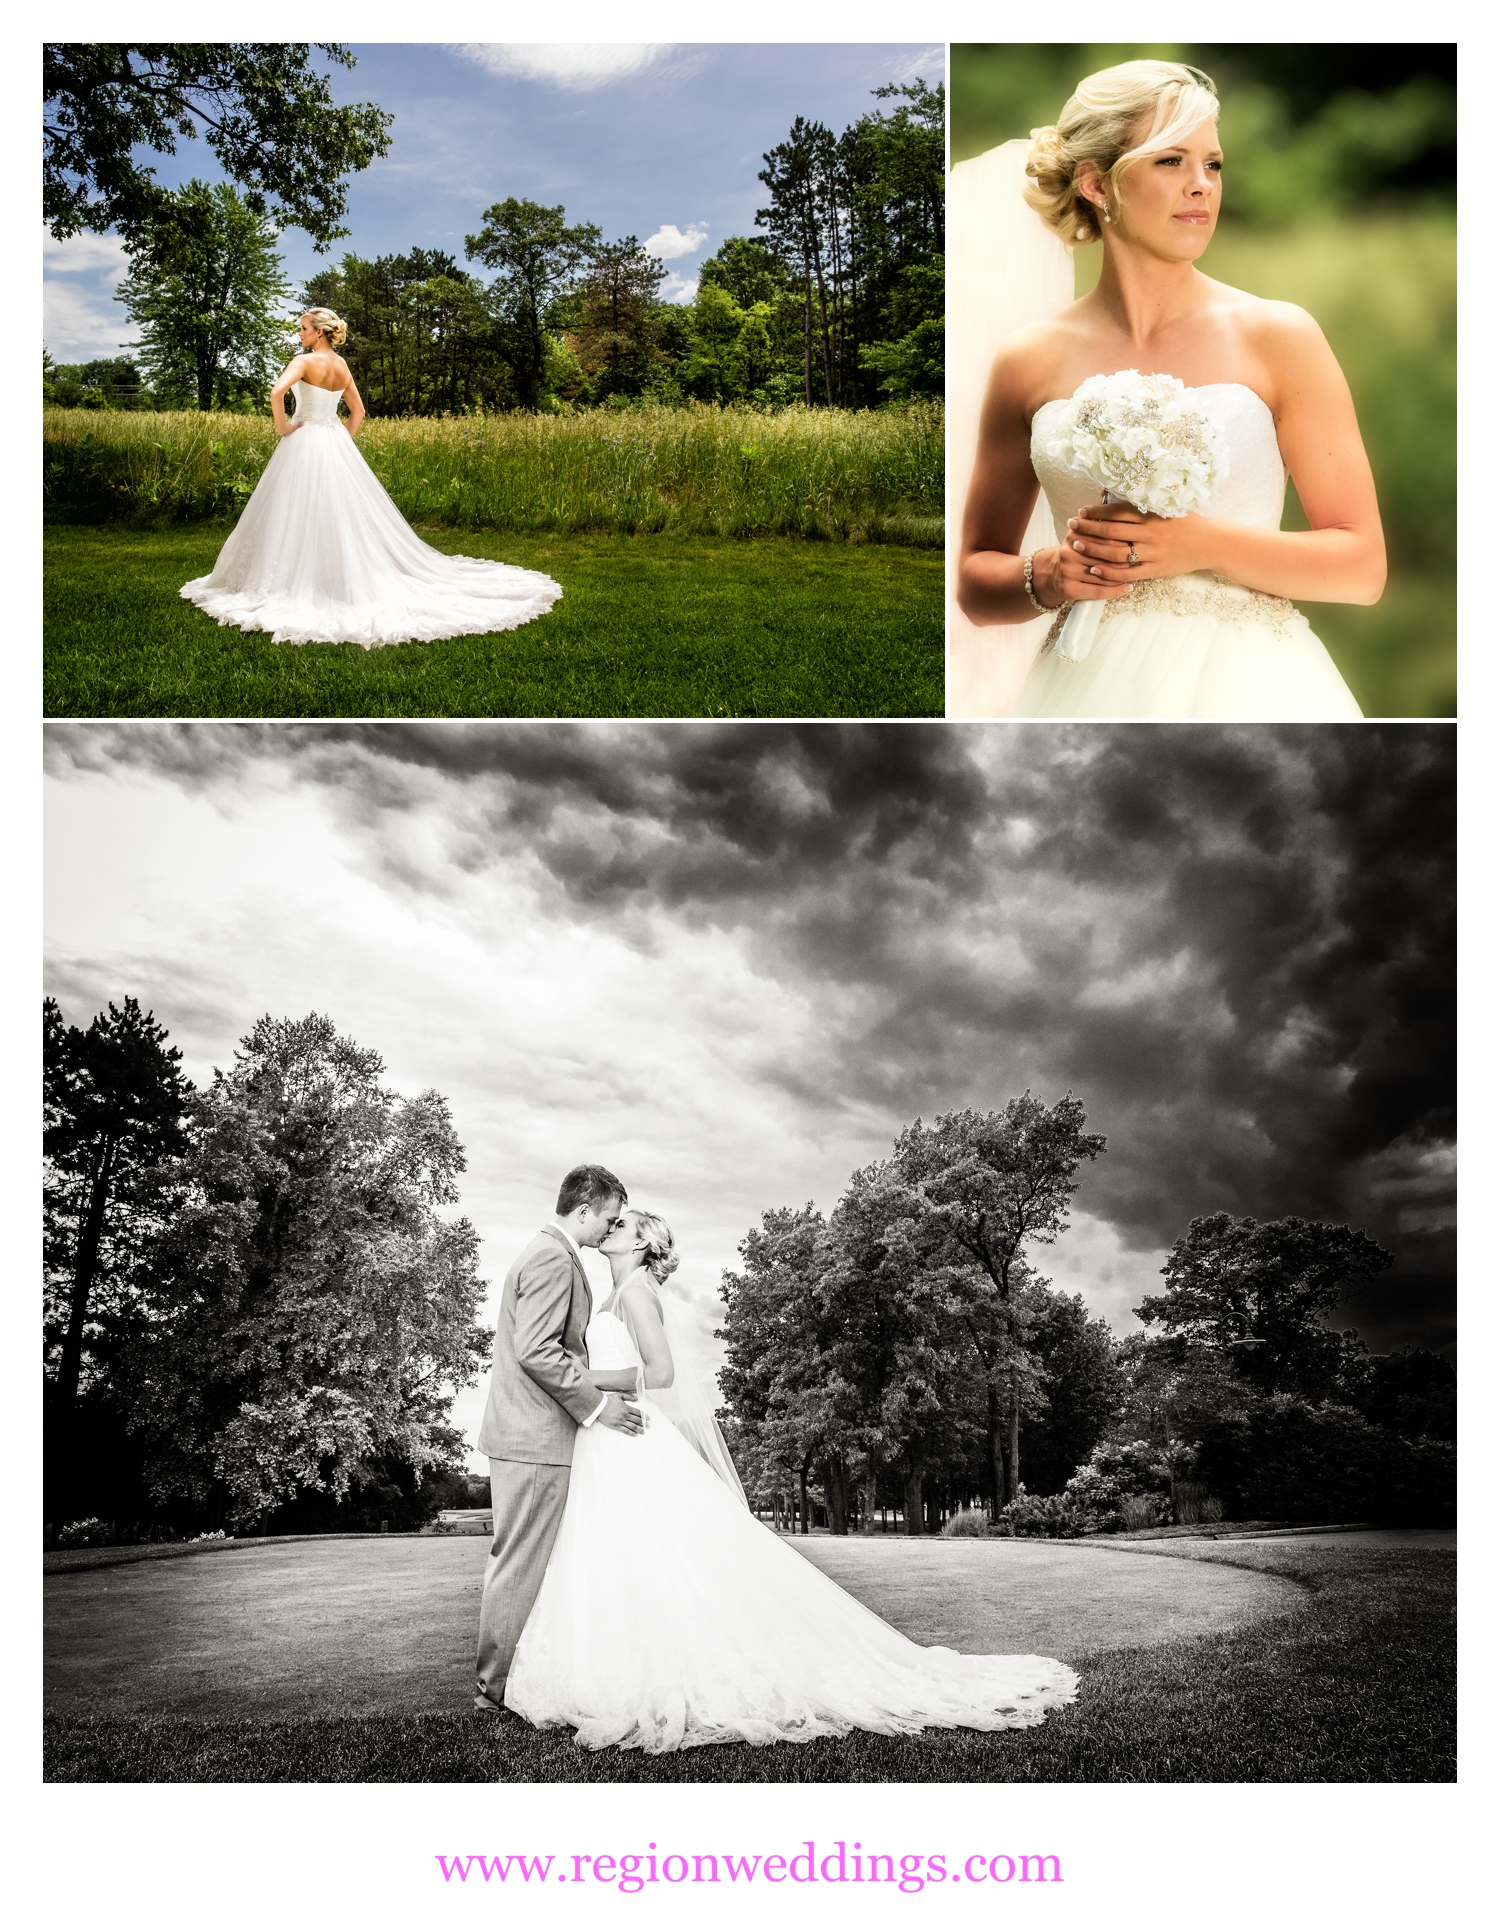 Wedding photos at The Pavilion At Sandy Pines.